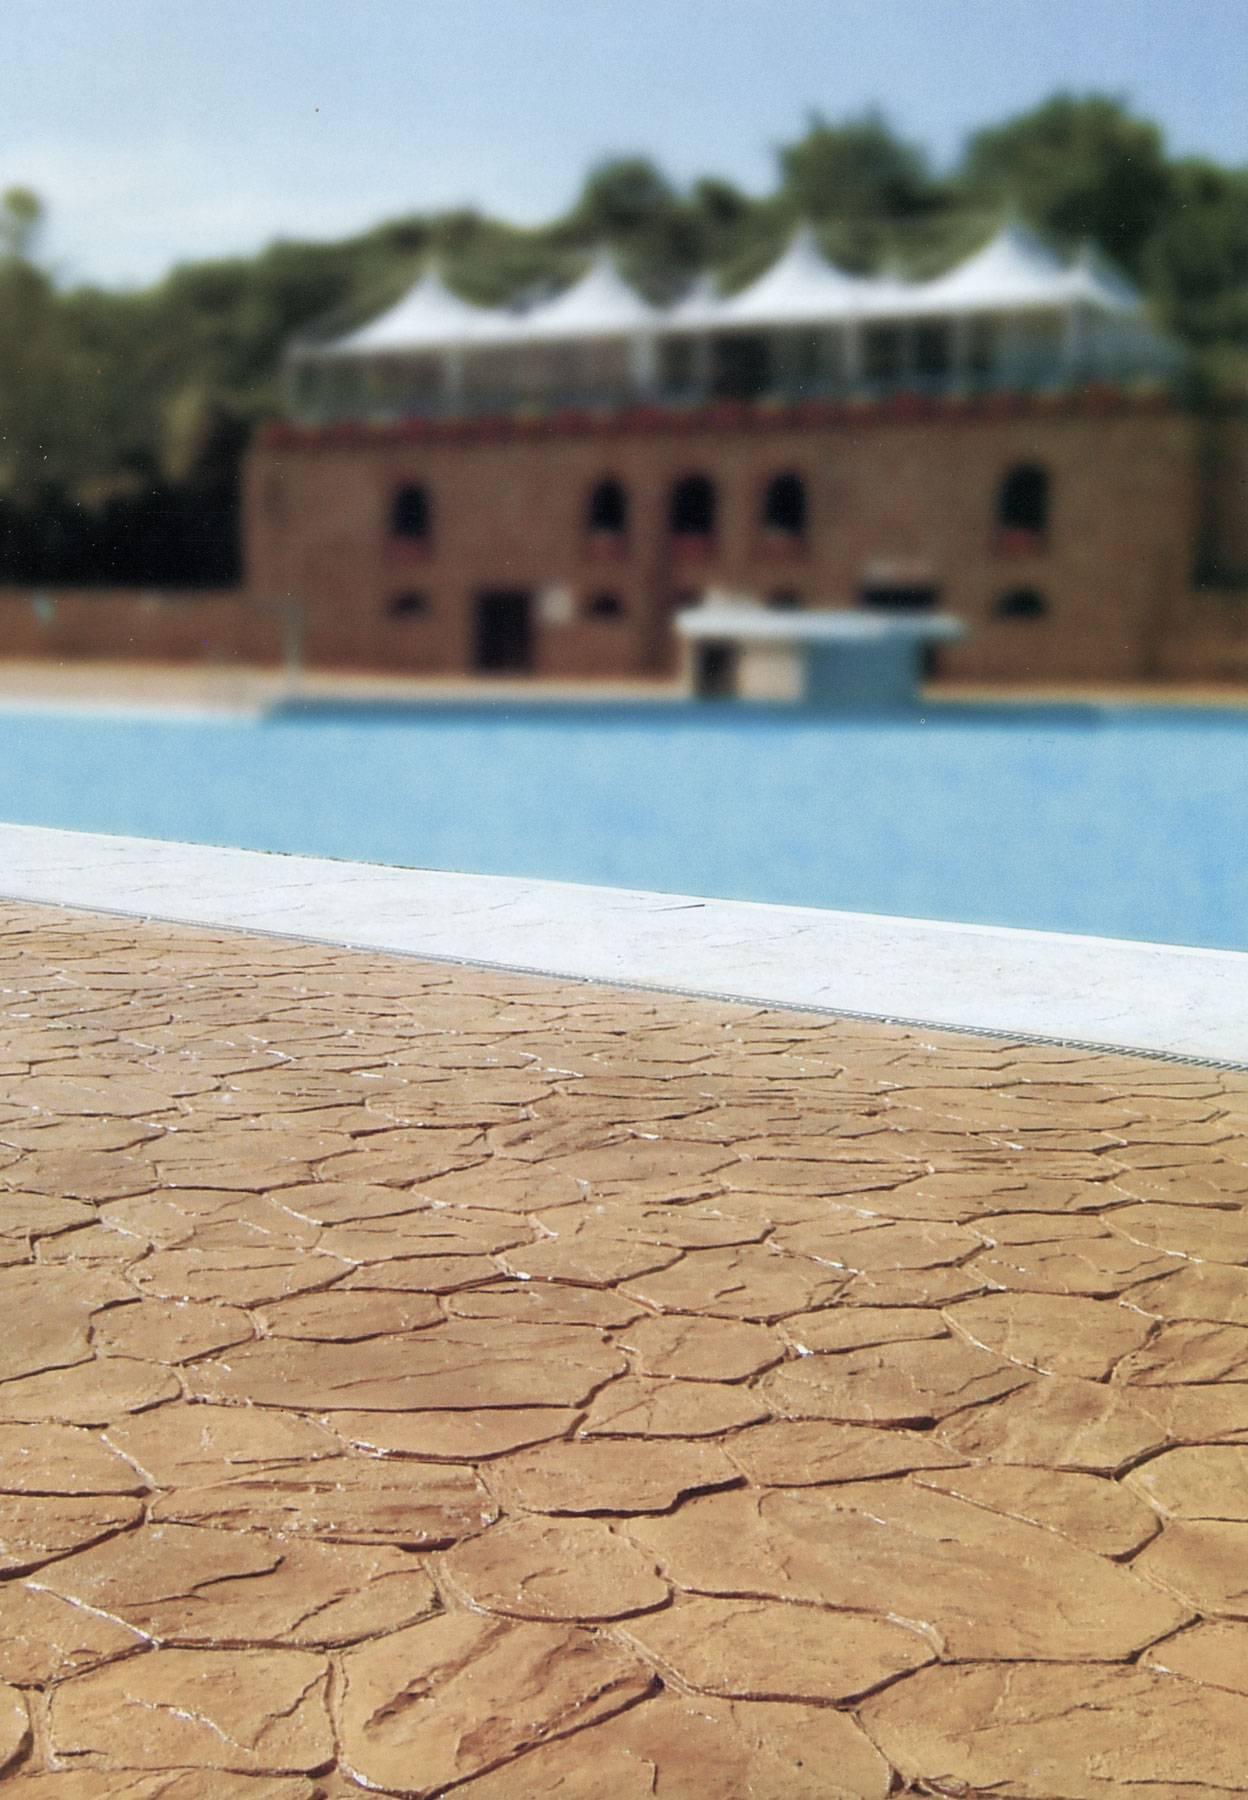 28 spazio esterno bordo piscina/ Finitura opus incertum (pietra irregolare) / Colore noce